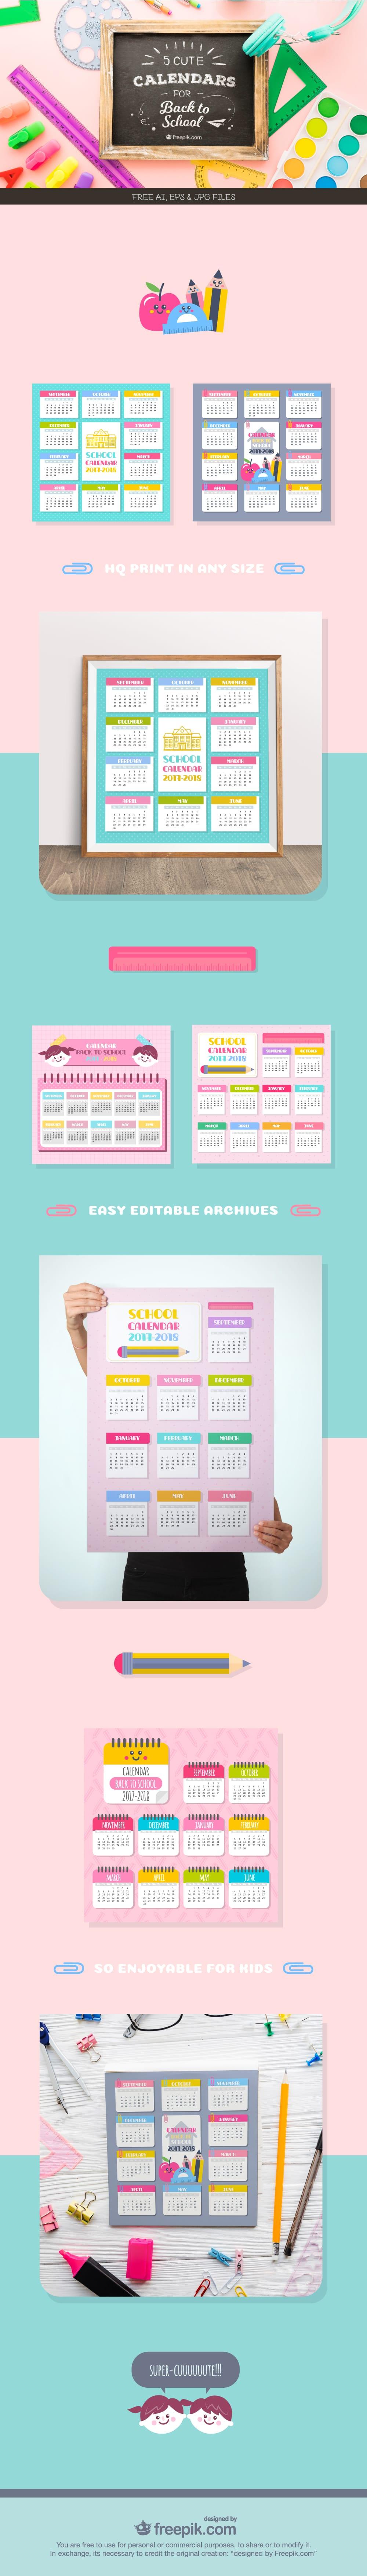 free school calendar templates